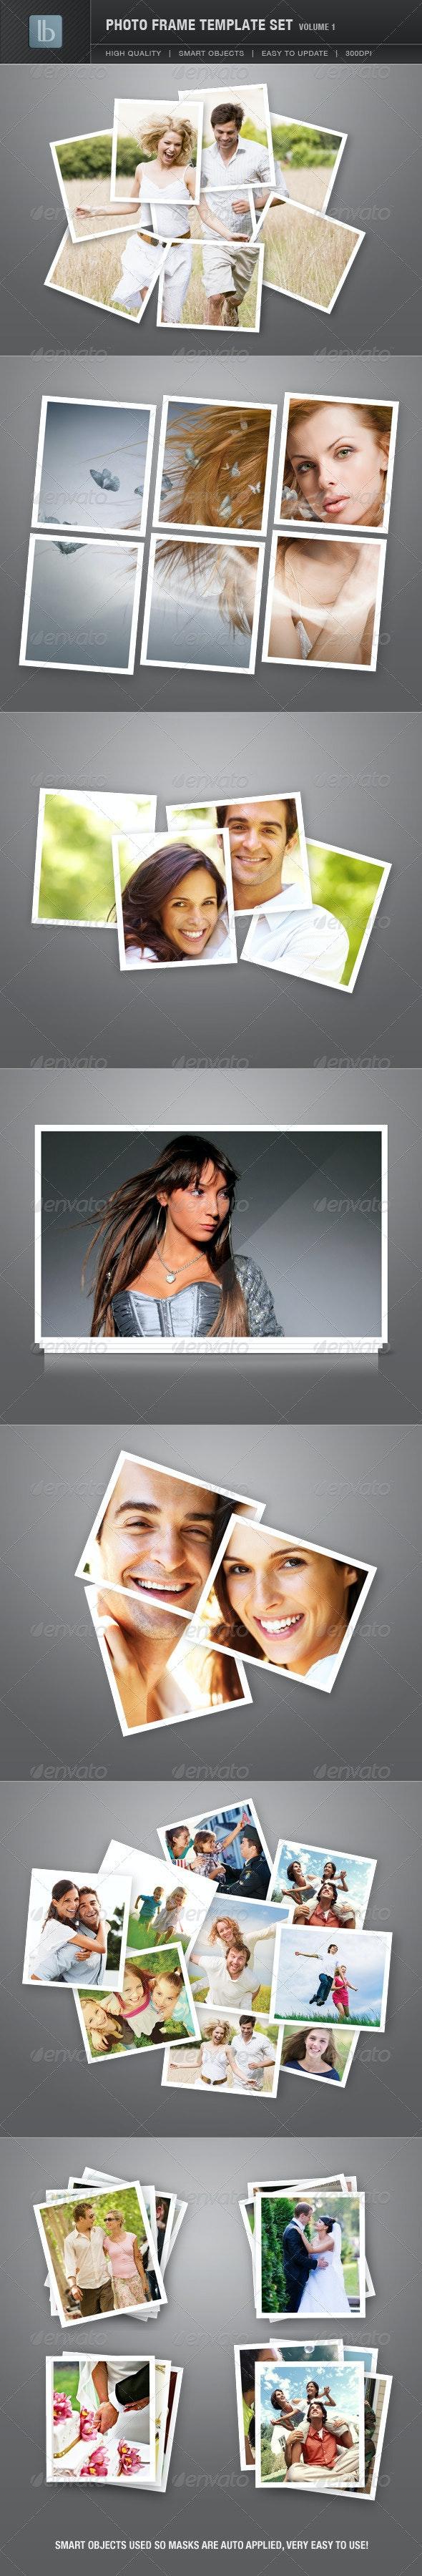 Photo Frame Template Set | Vol 1 - Photo Templates Graphics